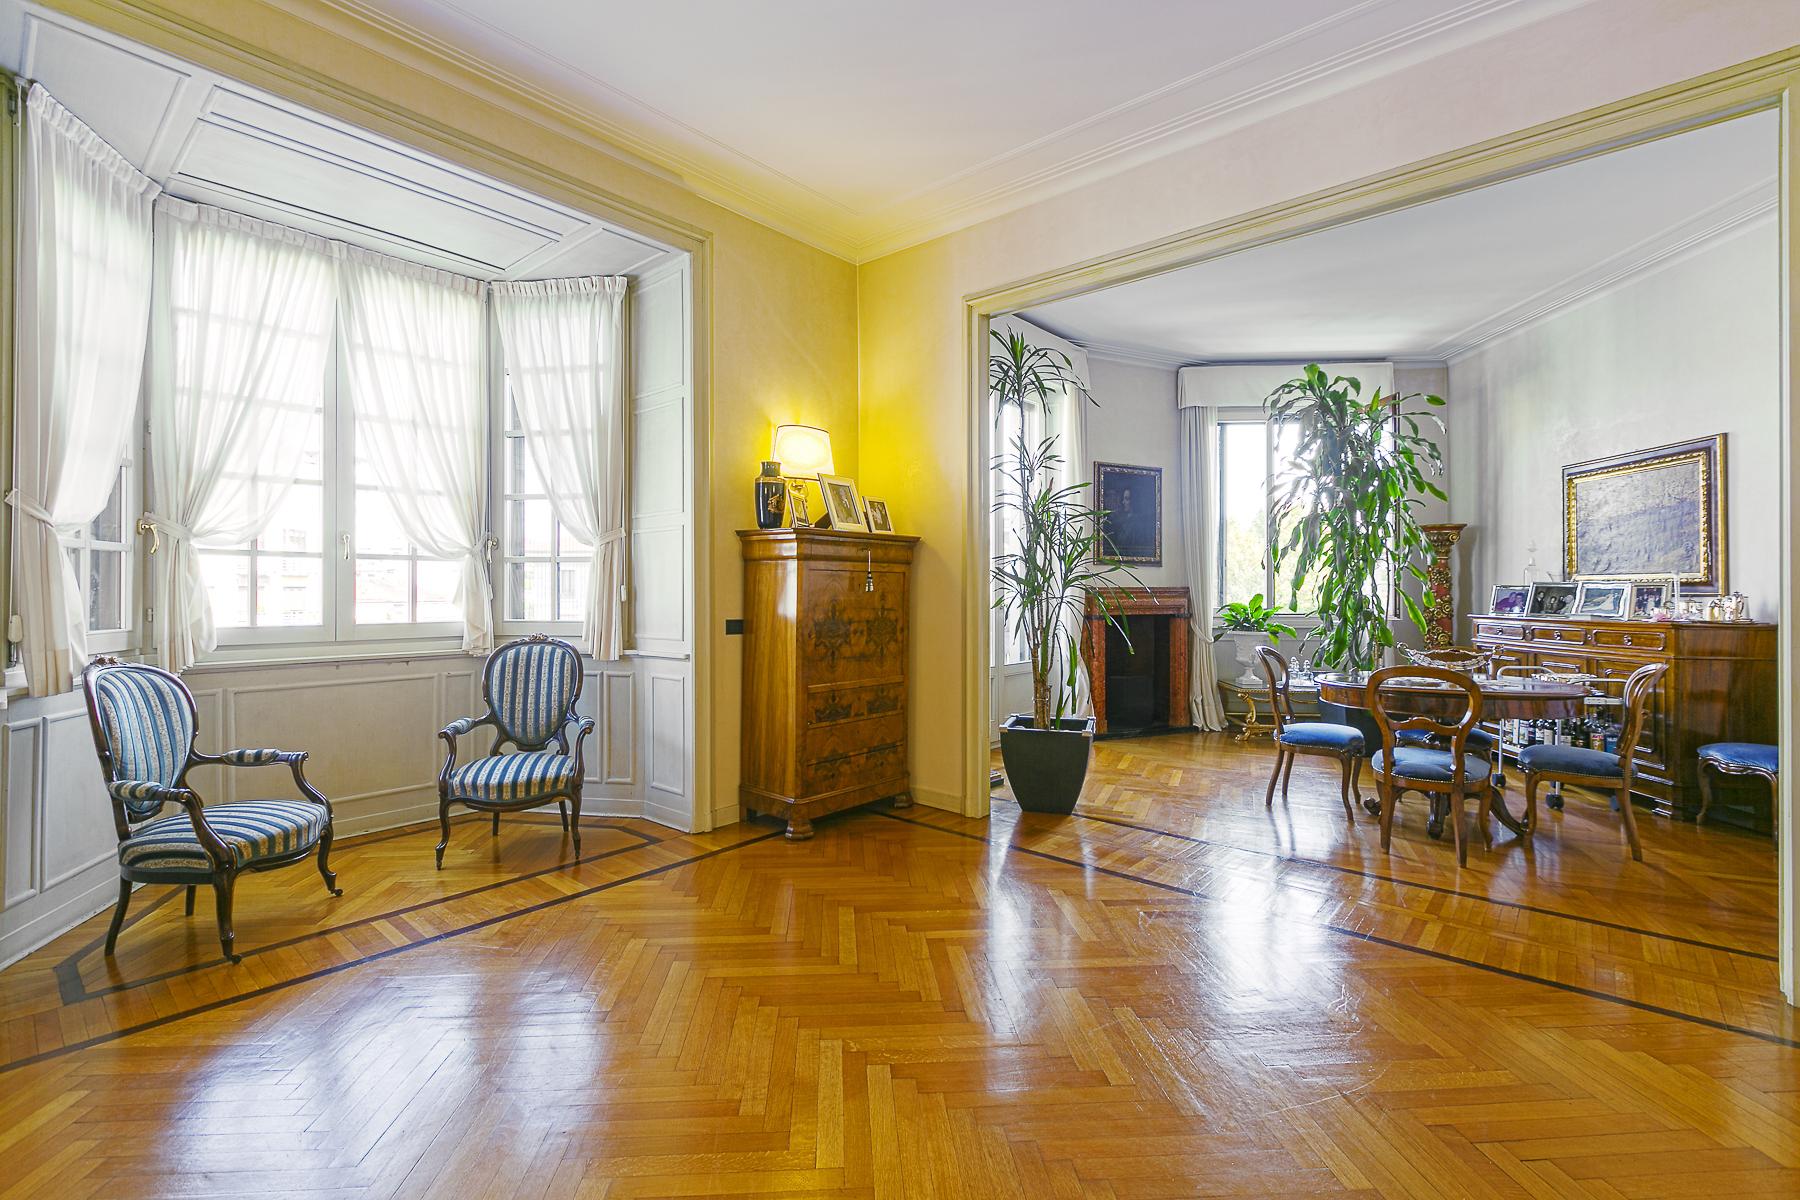 Additional photo for property listing at Splendid apartament in a prestigious building via Cadamosto Milano, Milan 20129 Italien